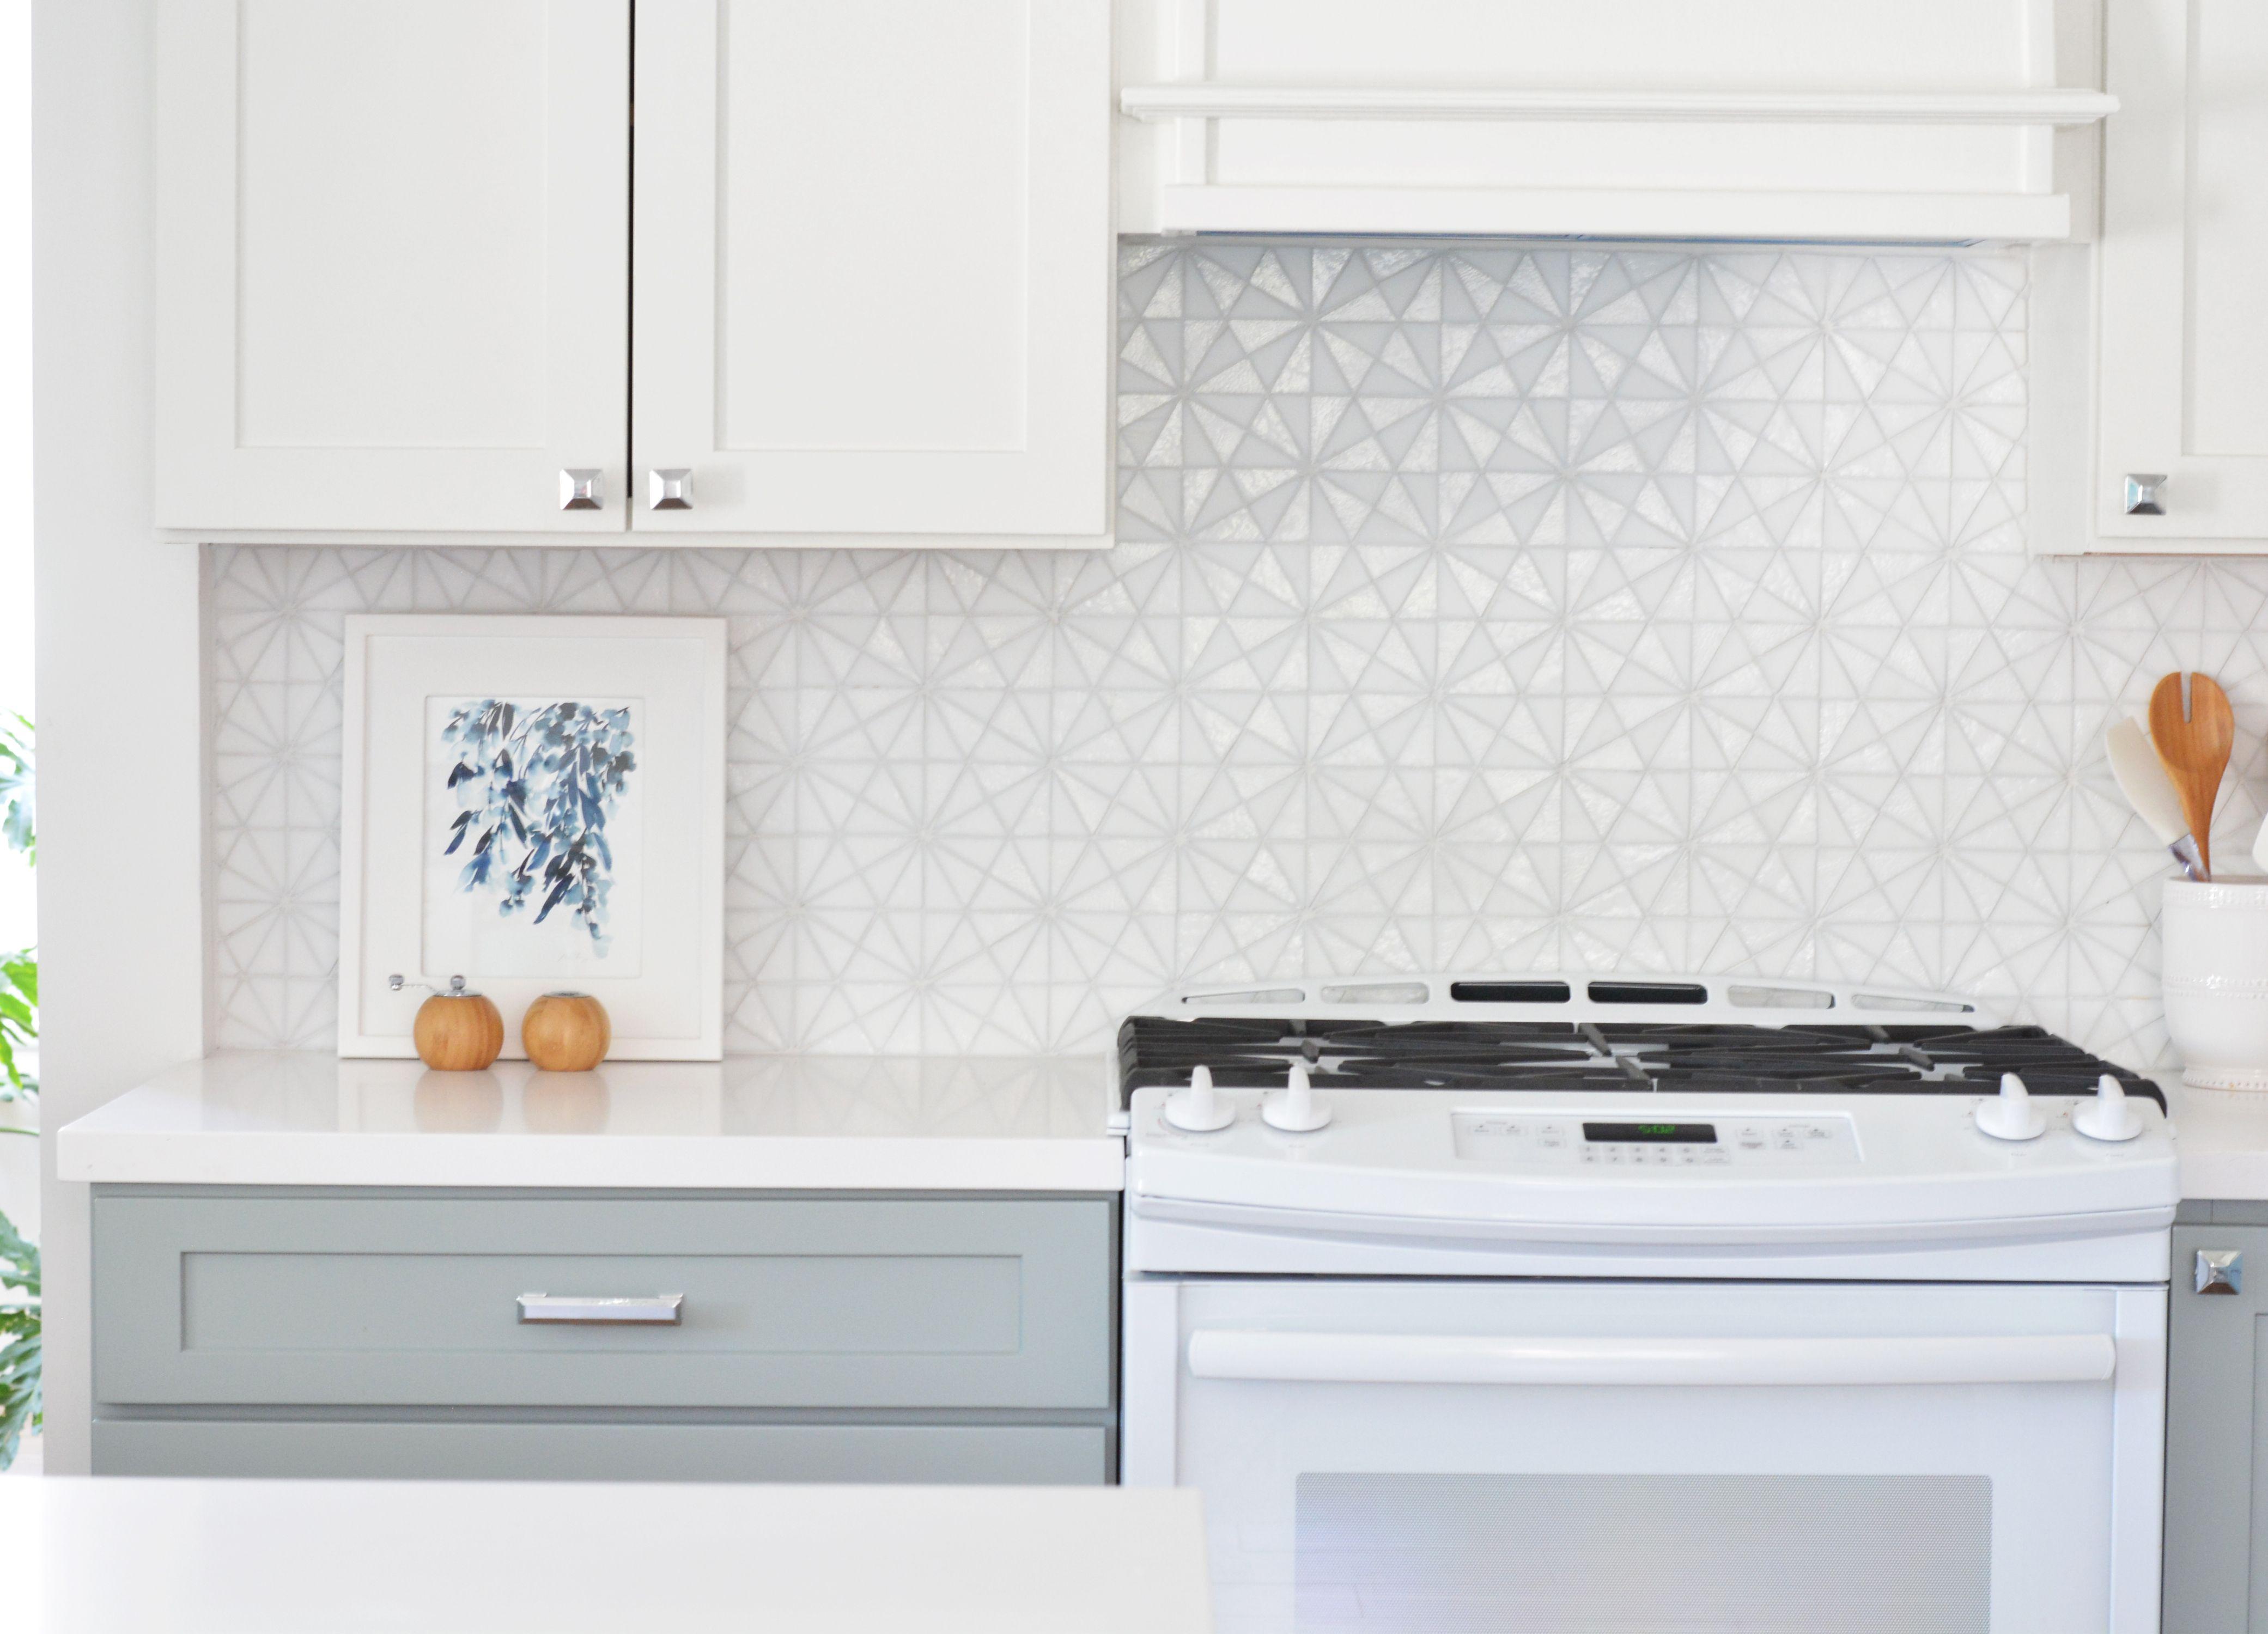 Kitchen Hd S Patterned Backsplash Tile Ideas